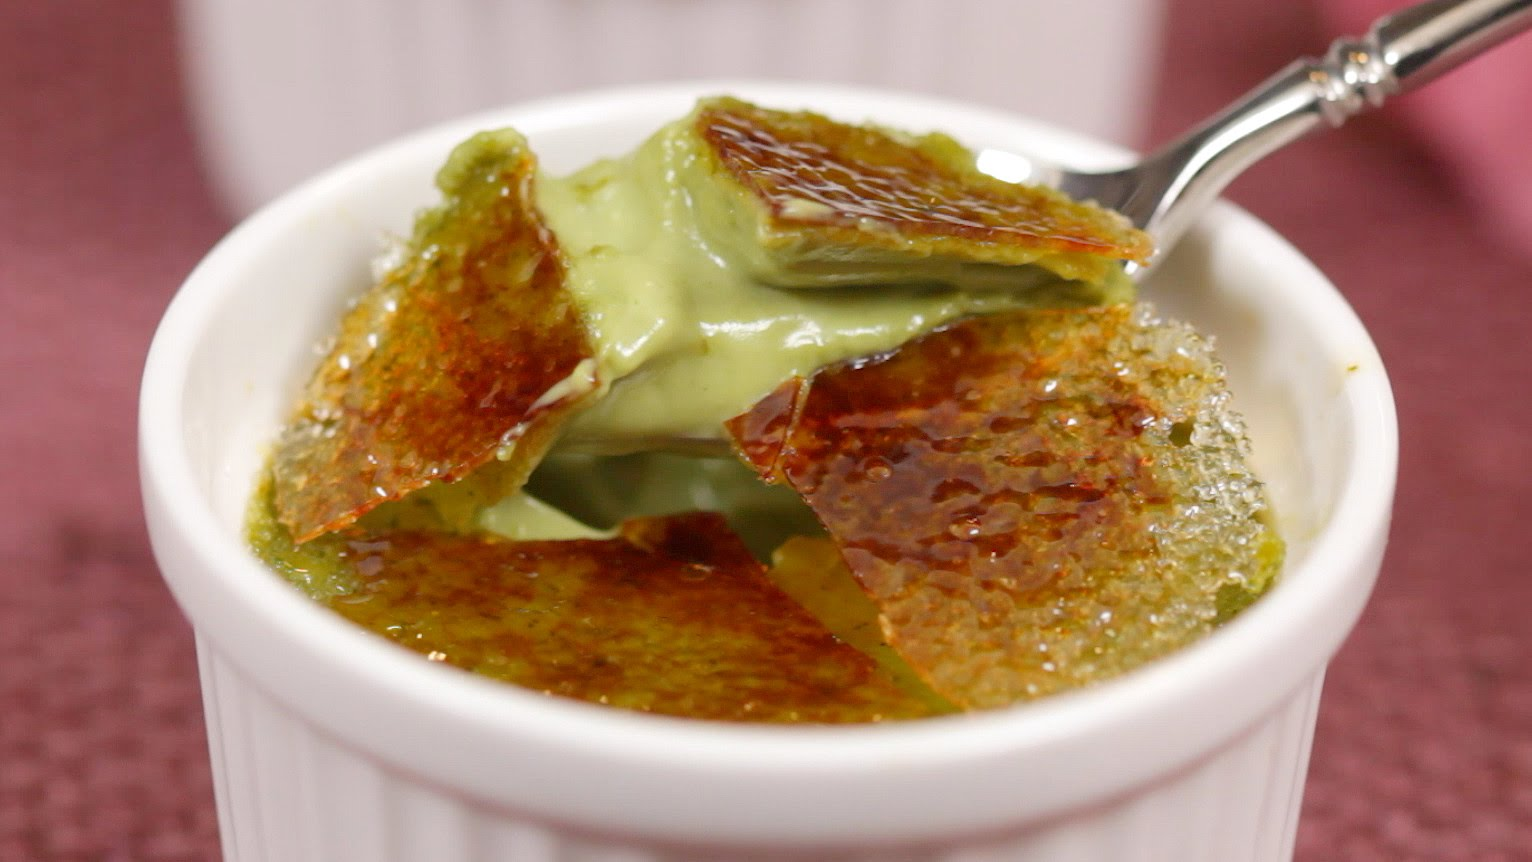 How to Make Green Tea Creme Brulee